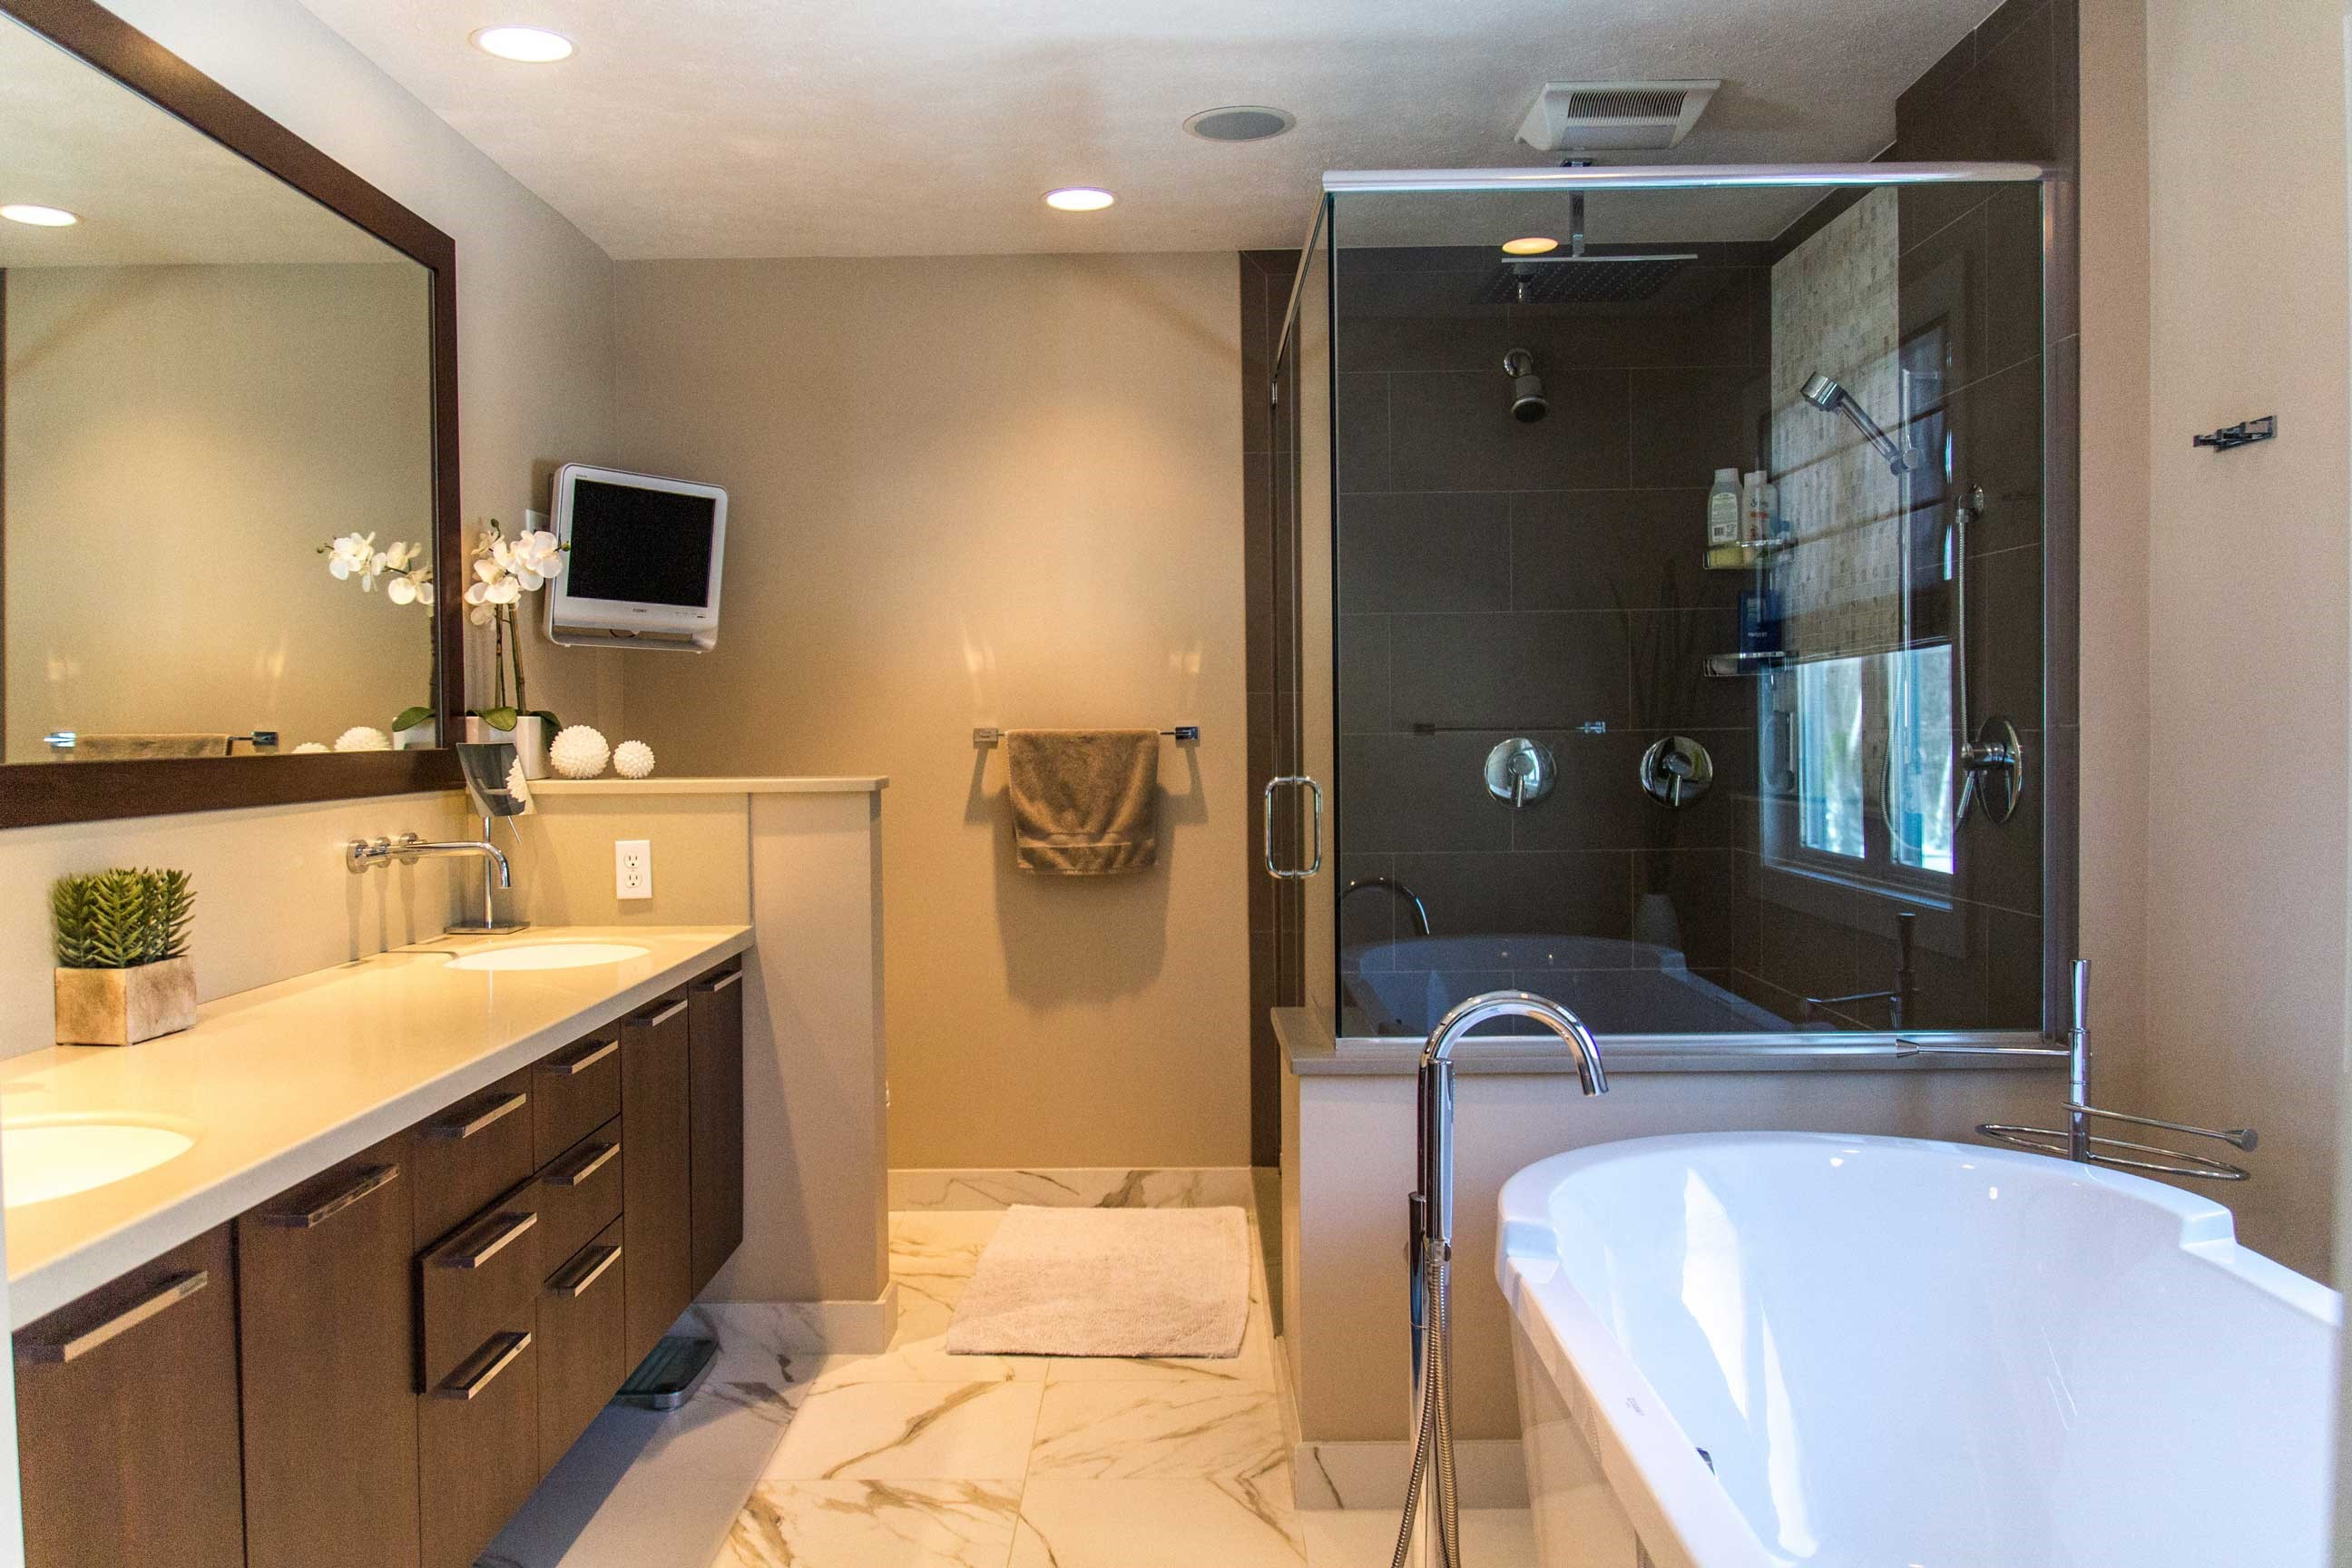 Floating Bathroom Vanity in Rochester, NY Bathroom Remodel